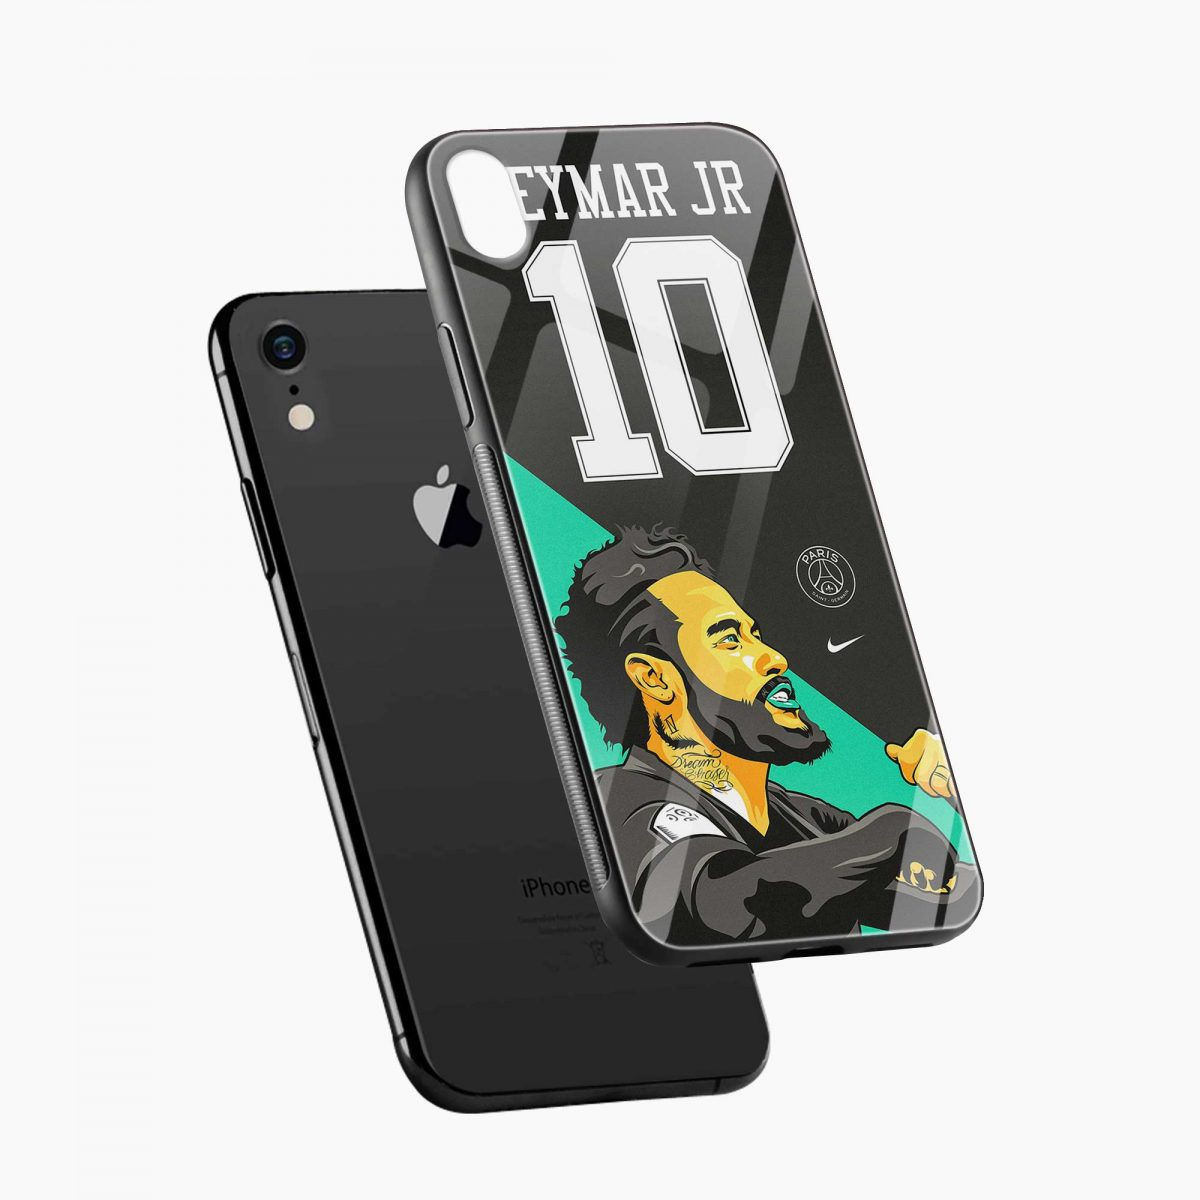 neymar jr 10 apple iphone xr back cover diagonal view